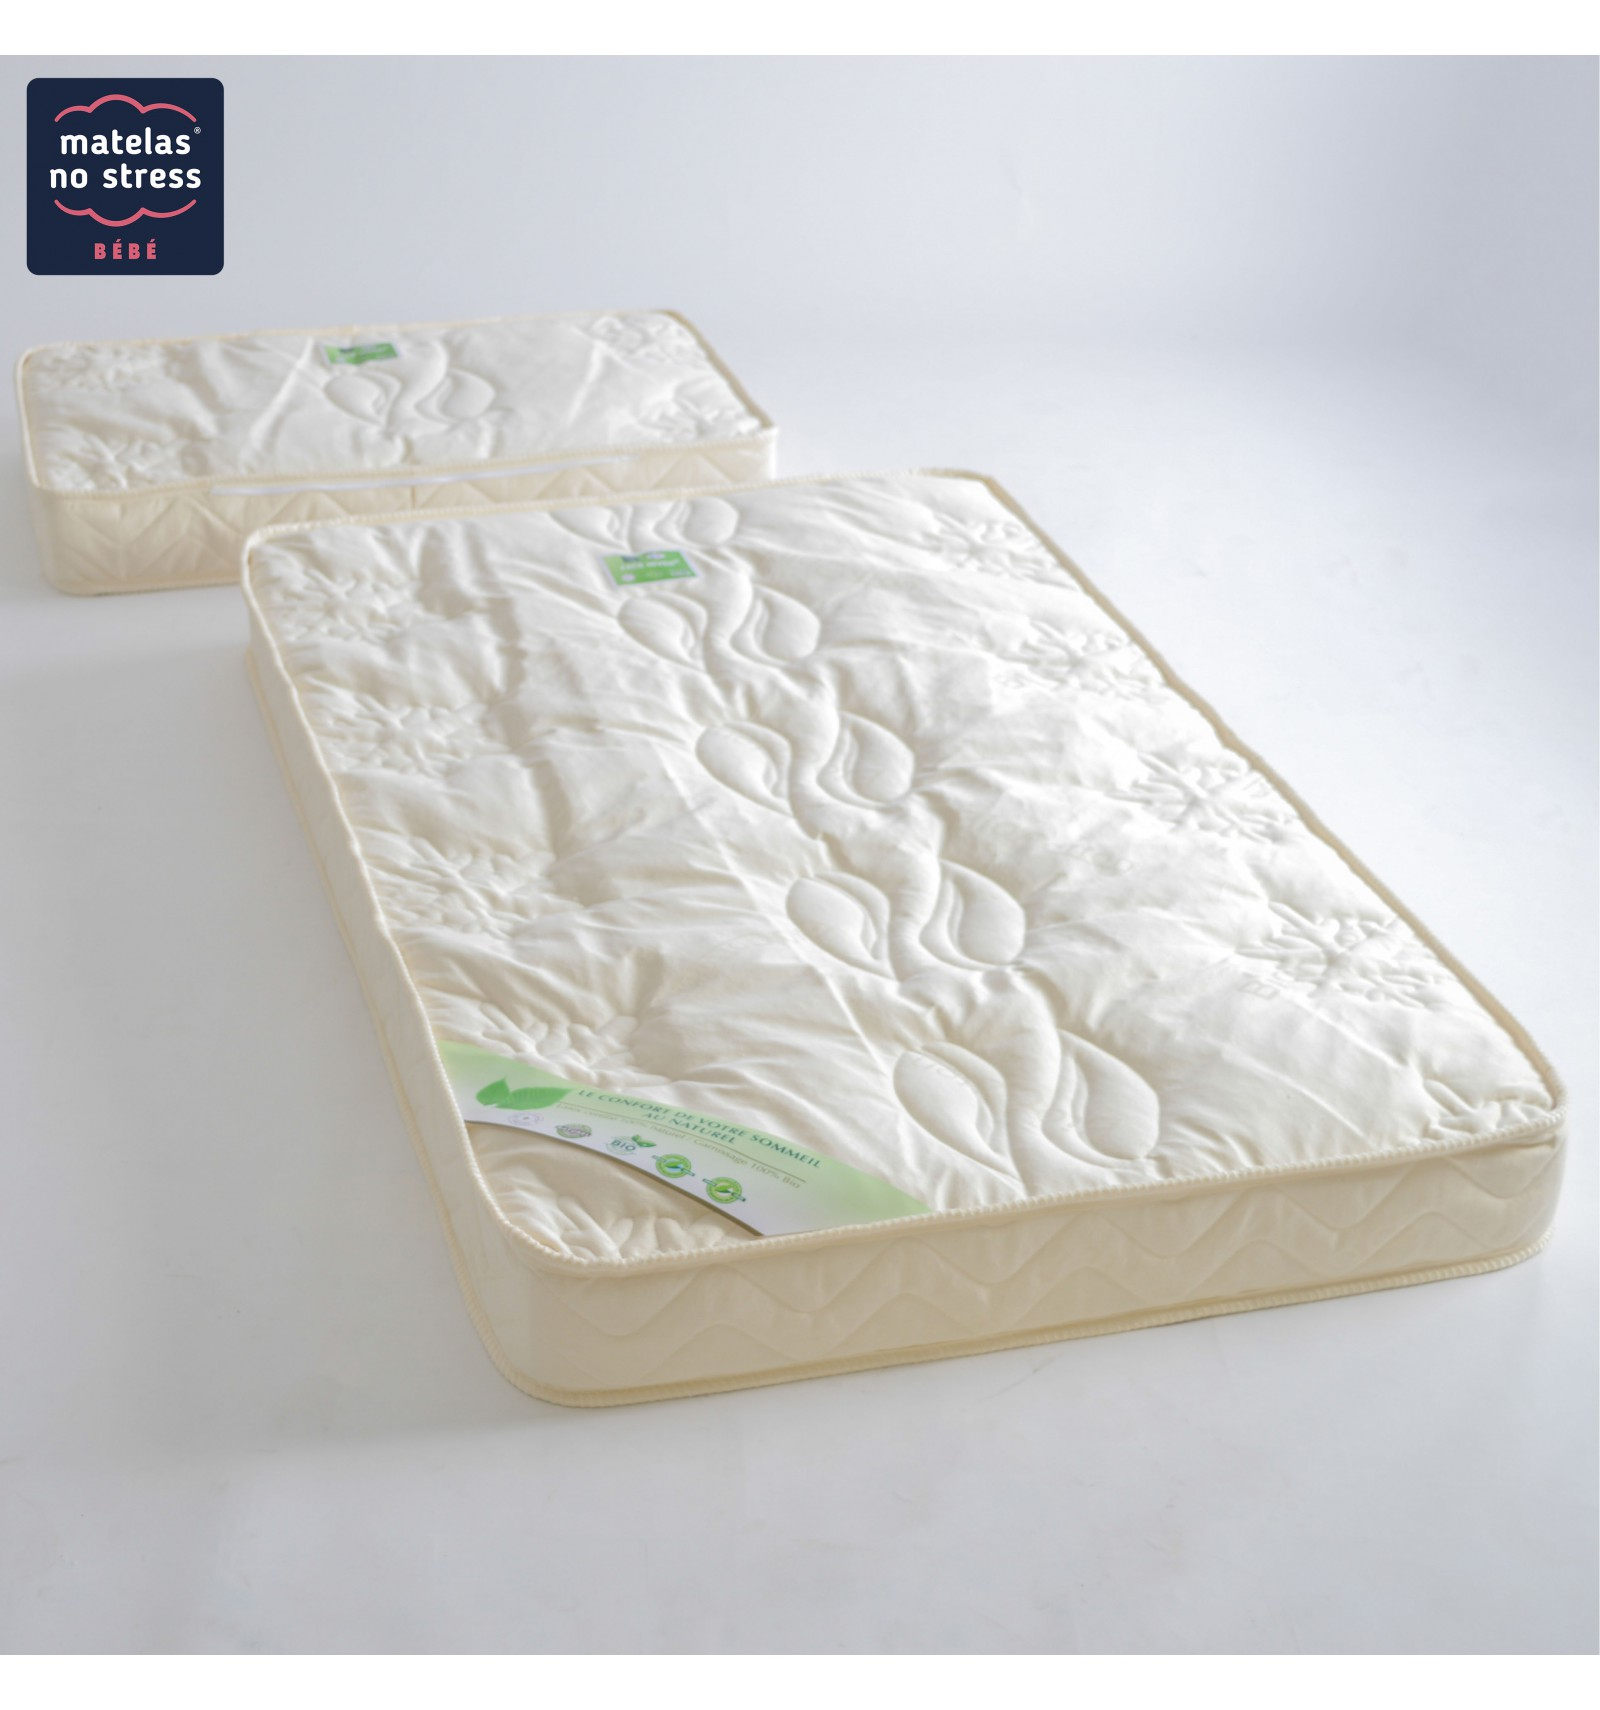 matelas evolutif en fibres de coco 90x140 plus 50x90 couffin matelas. Black Bedroom Furniture Sets. Home Design Ideas